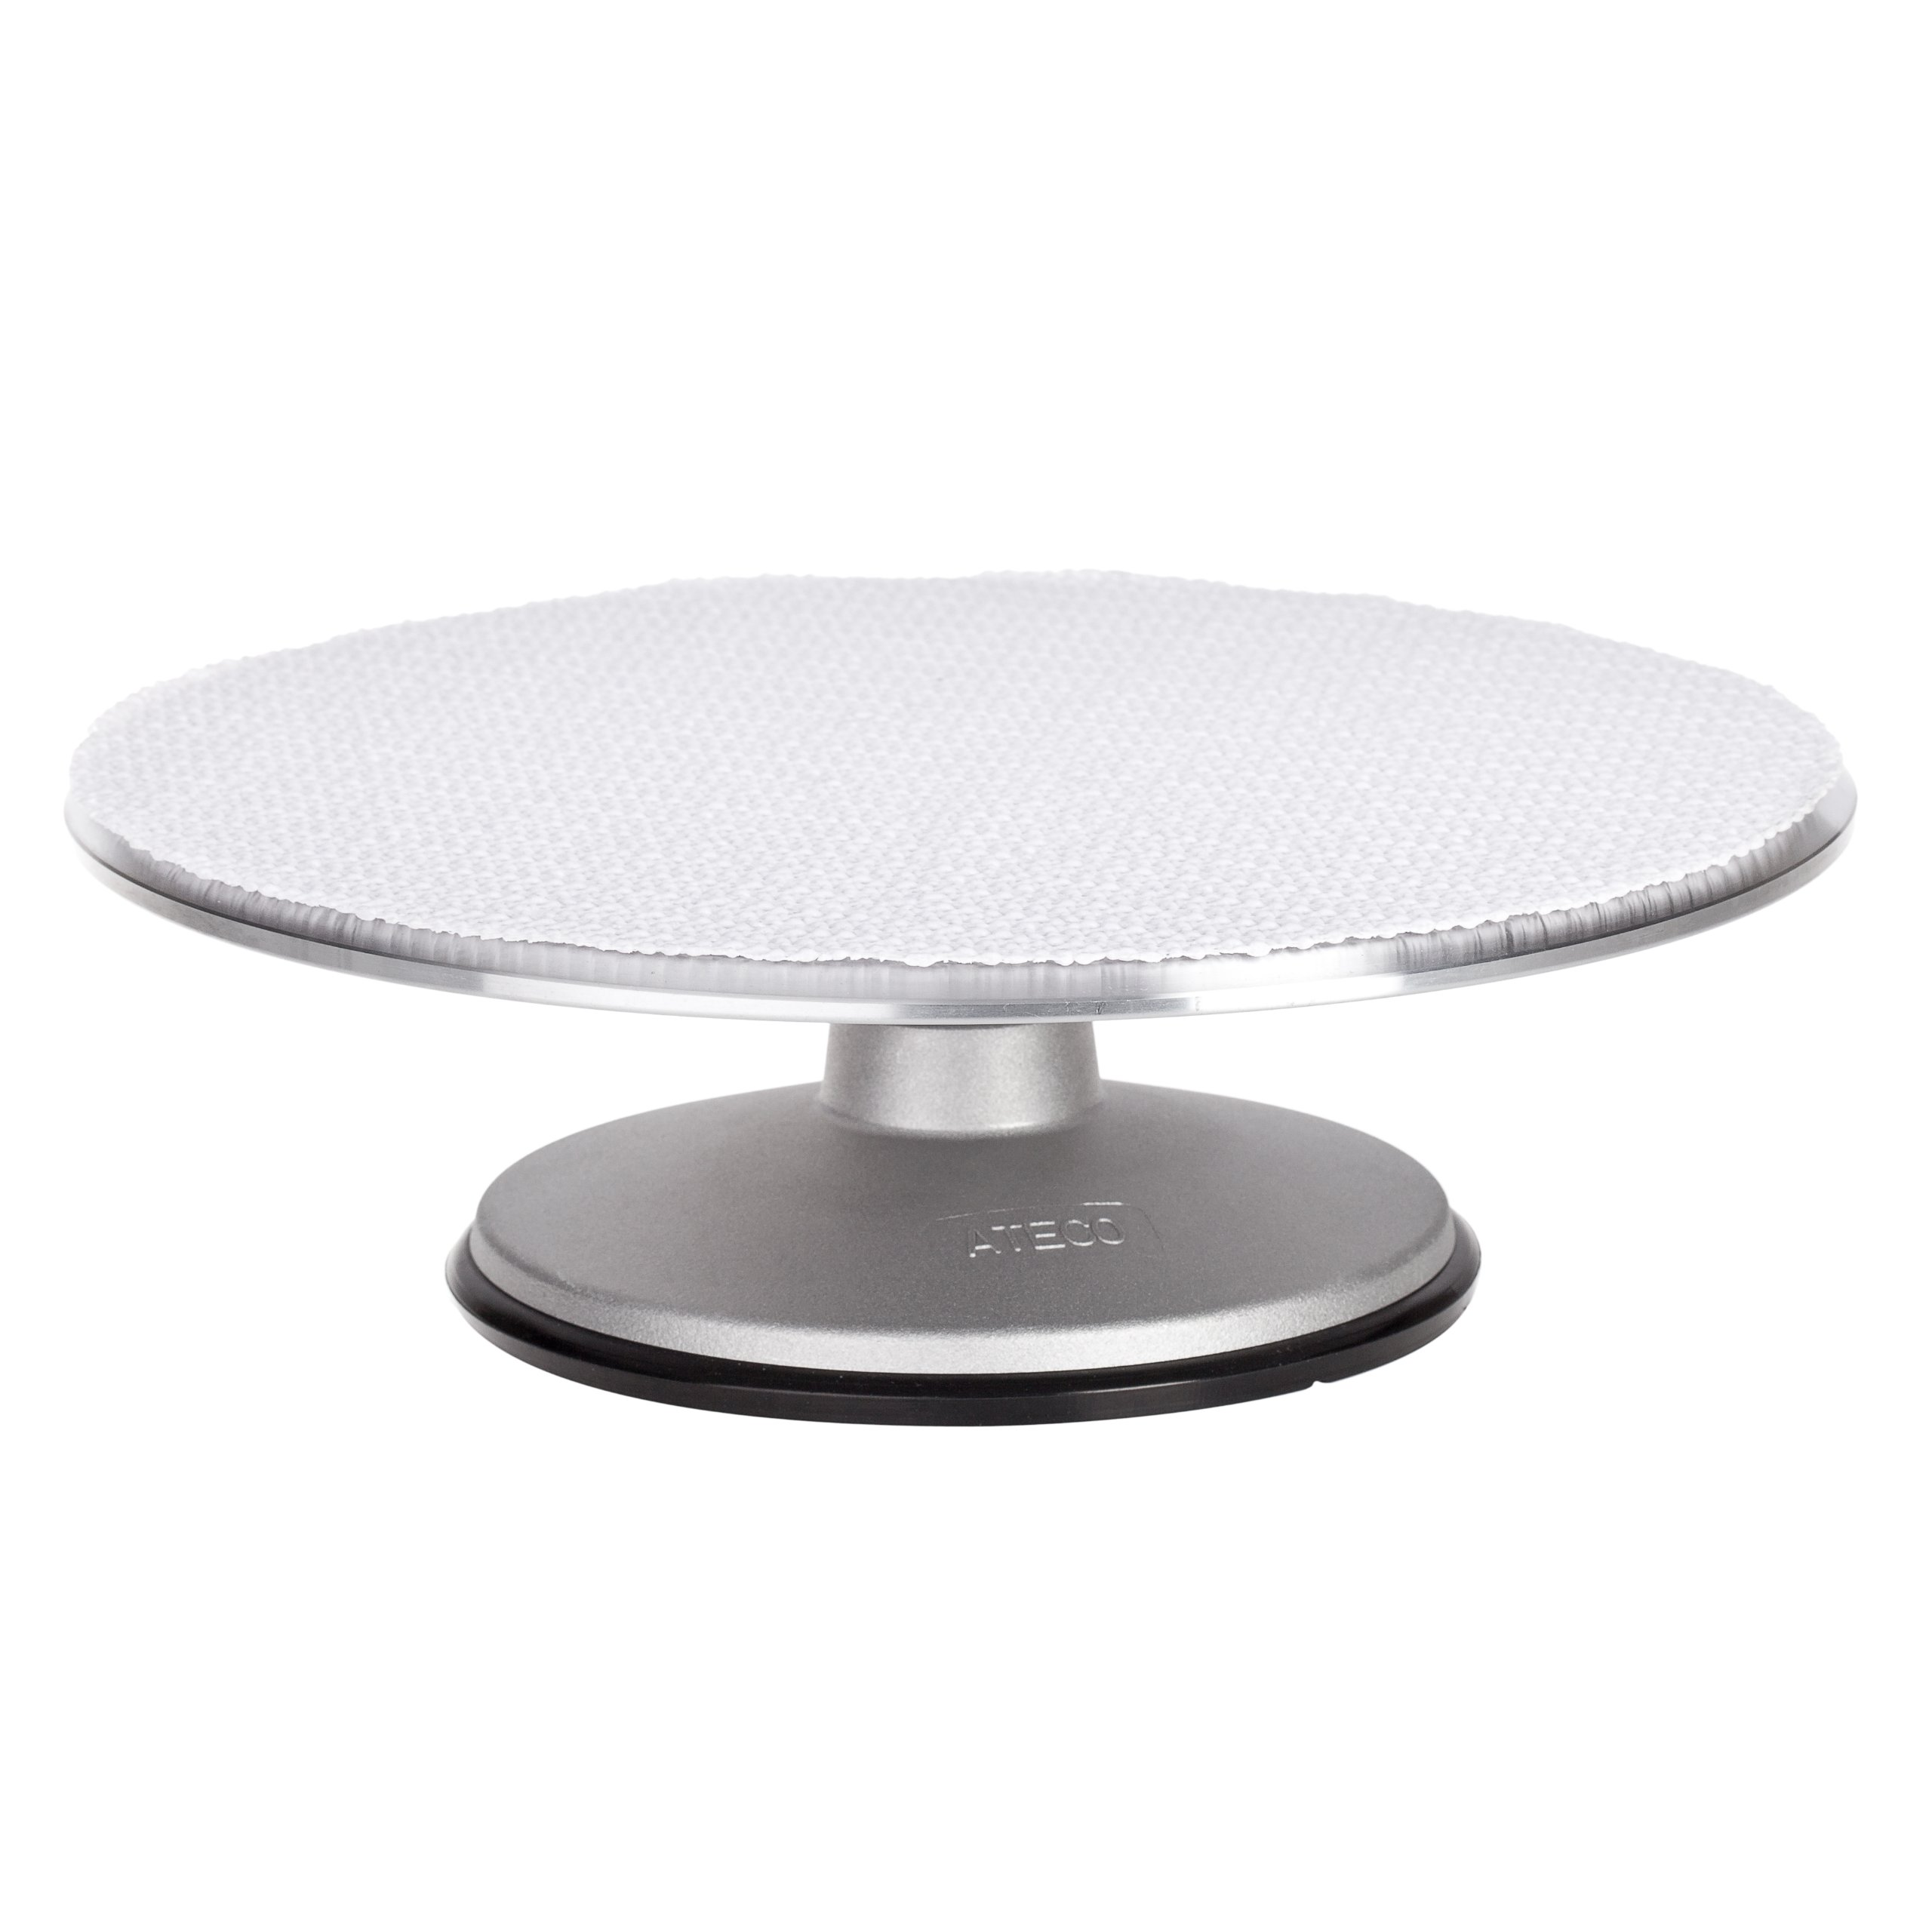 Ateco 613 Revolving Cake Decorating Stand, 12'' Round, Aluminum Base with 1/8'' Aluminum Top